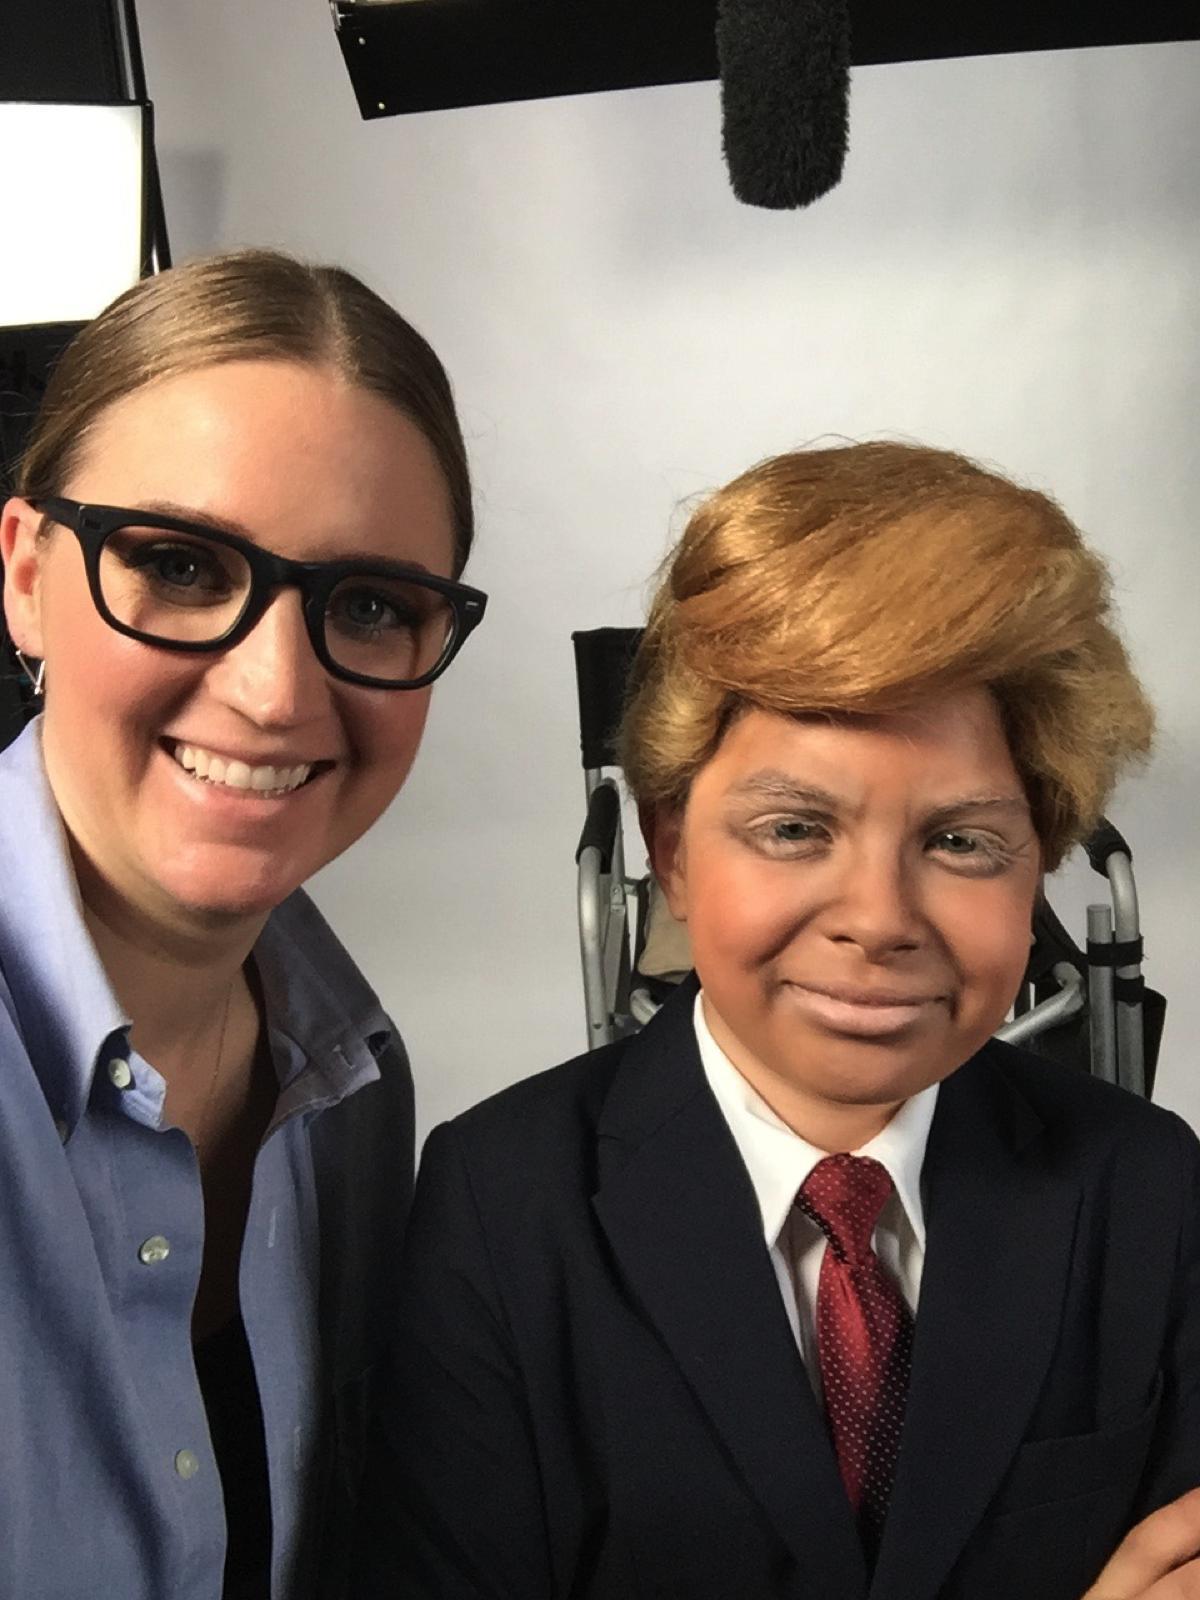 Trump Mode